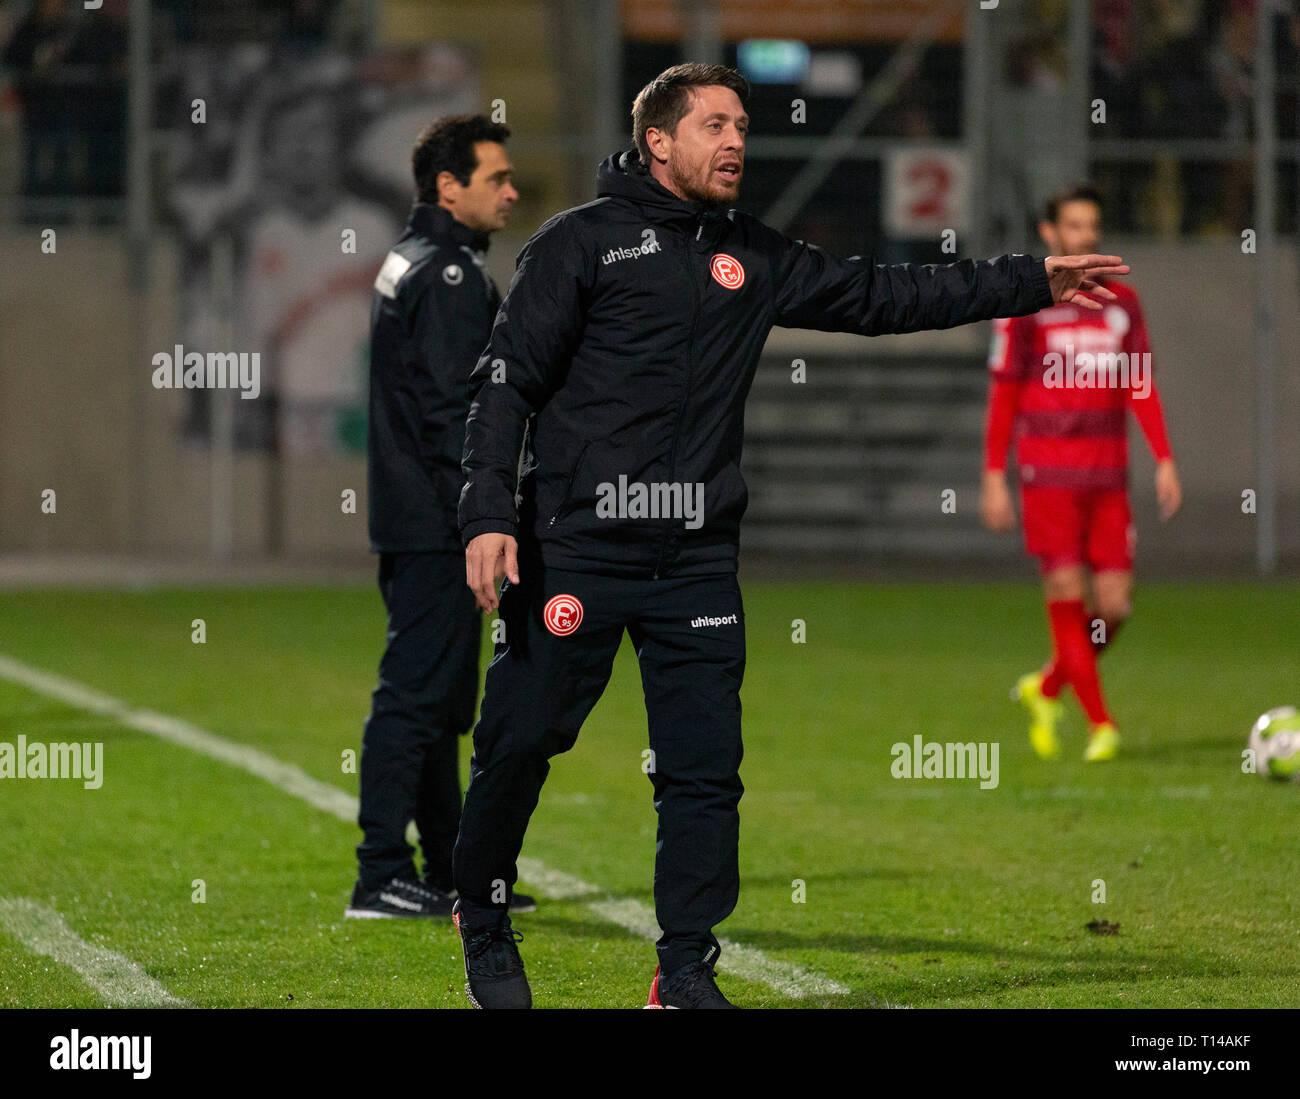 sports, football, Regional League West, 2018/2019, Rot Weiss Oberhausen vs Fortuna Duesseldorf U23 3-3, Stadium Niederrhein in Oberhausen, Andreas Lambertz (Fortuna) - Stock Image